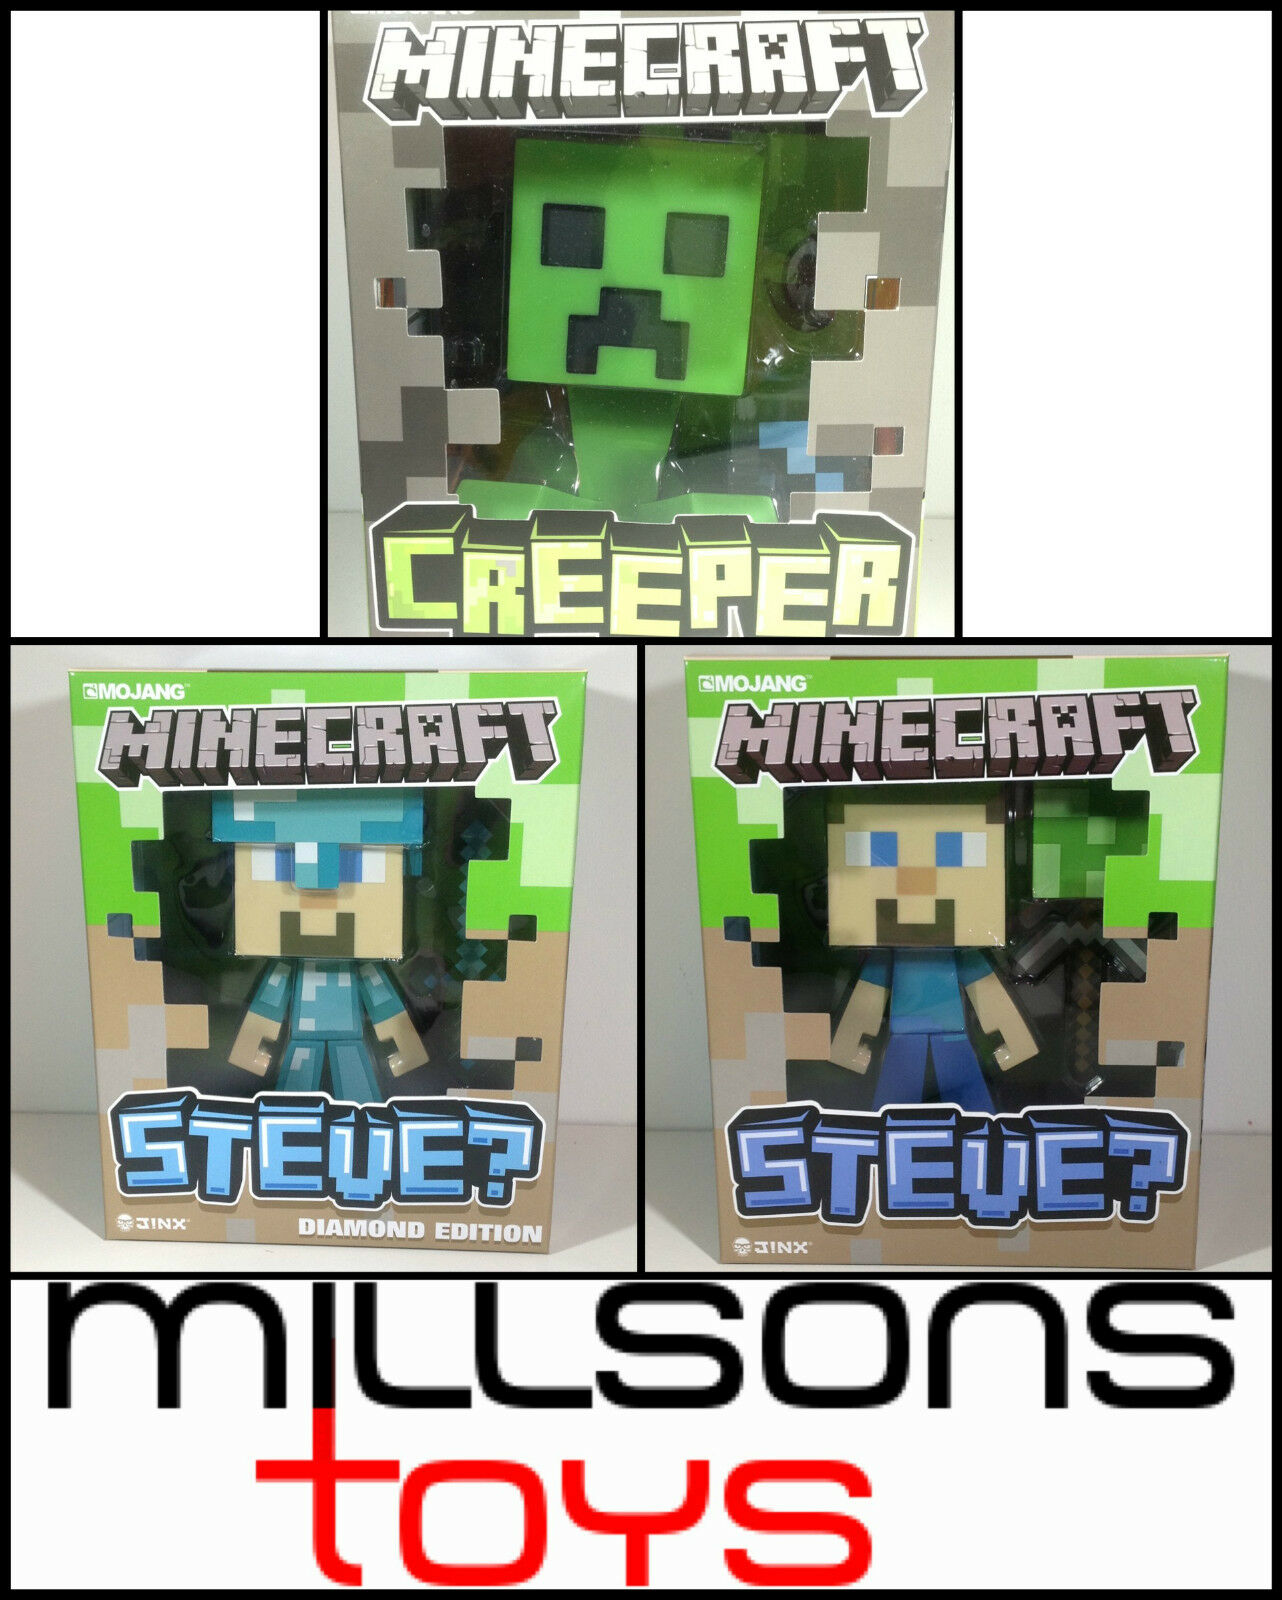 Minecraft regualr & diamant - niete - 15.2cm figuren - spanisch u.a. neu